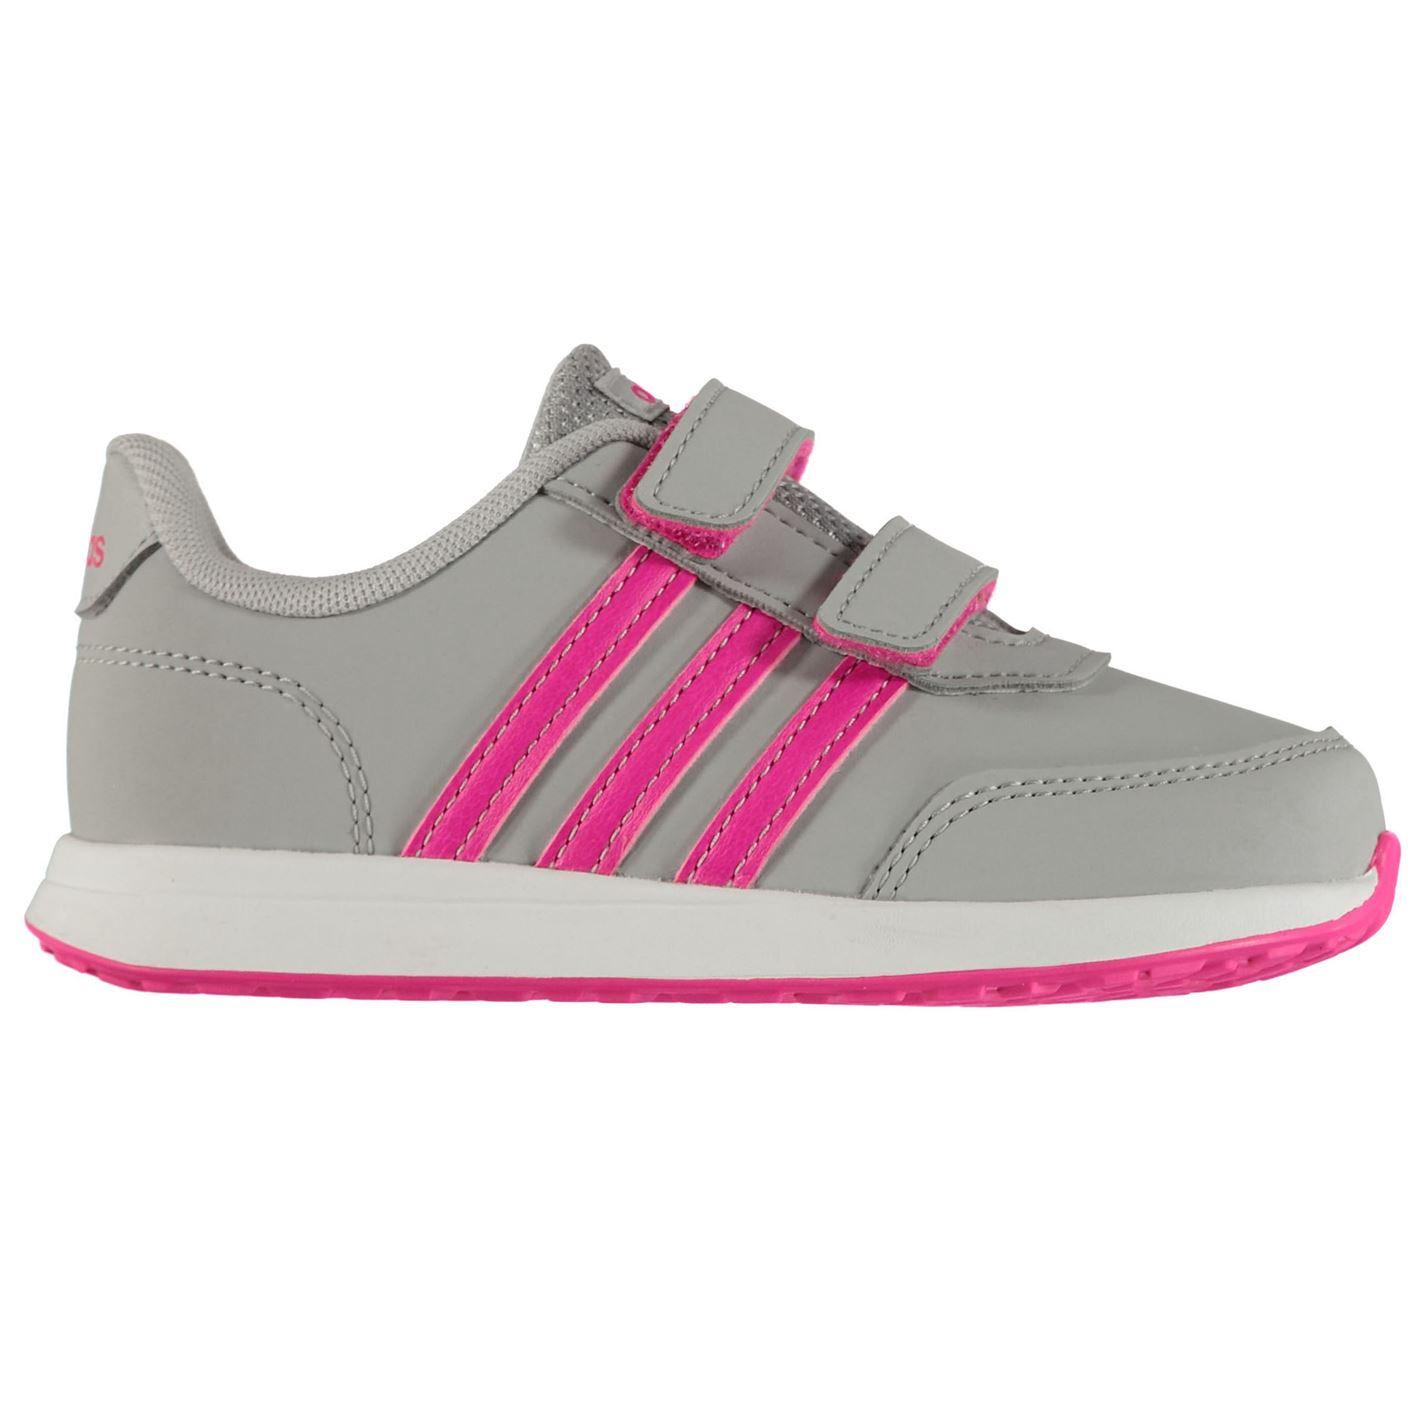 Adidas Switch Girls Trainers